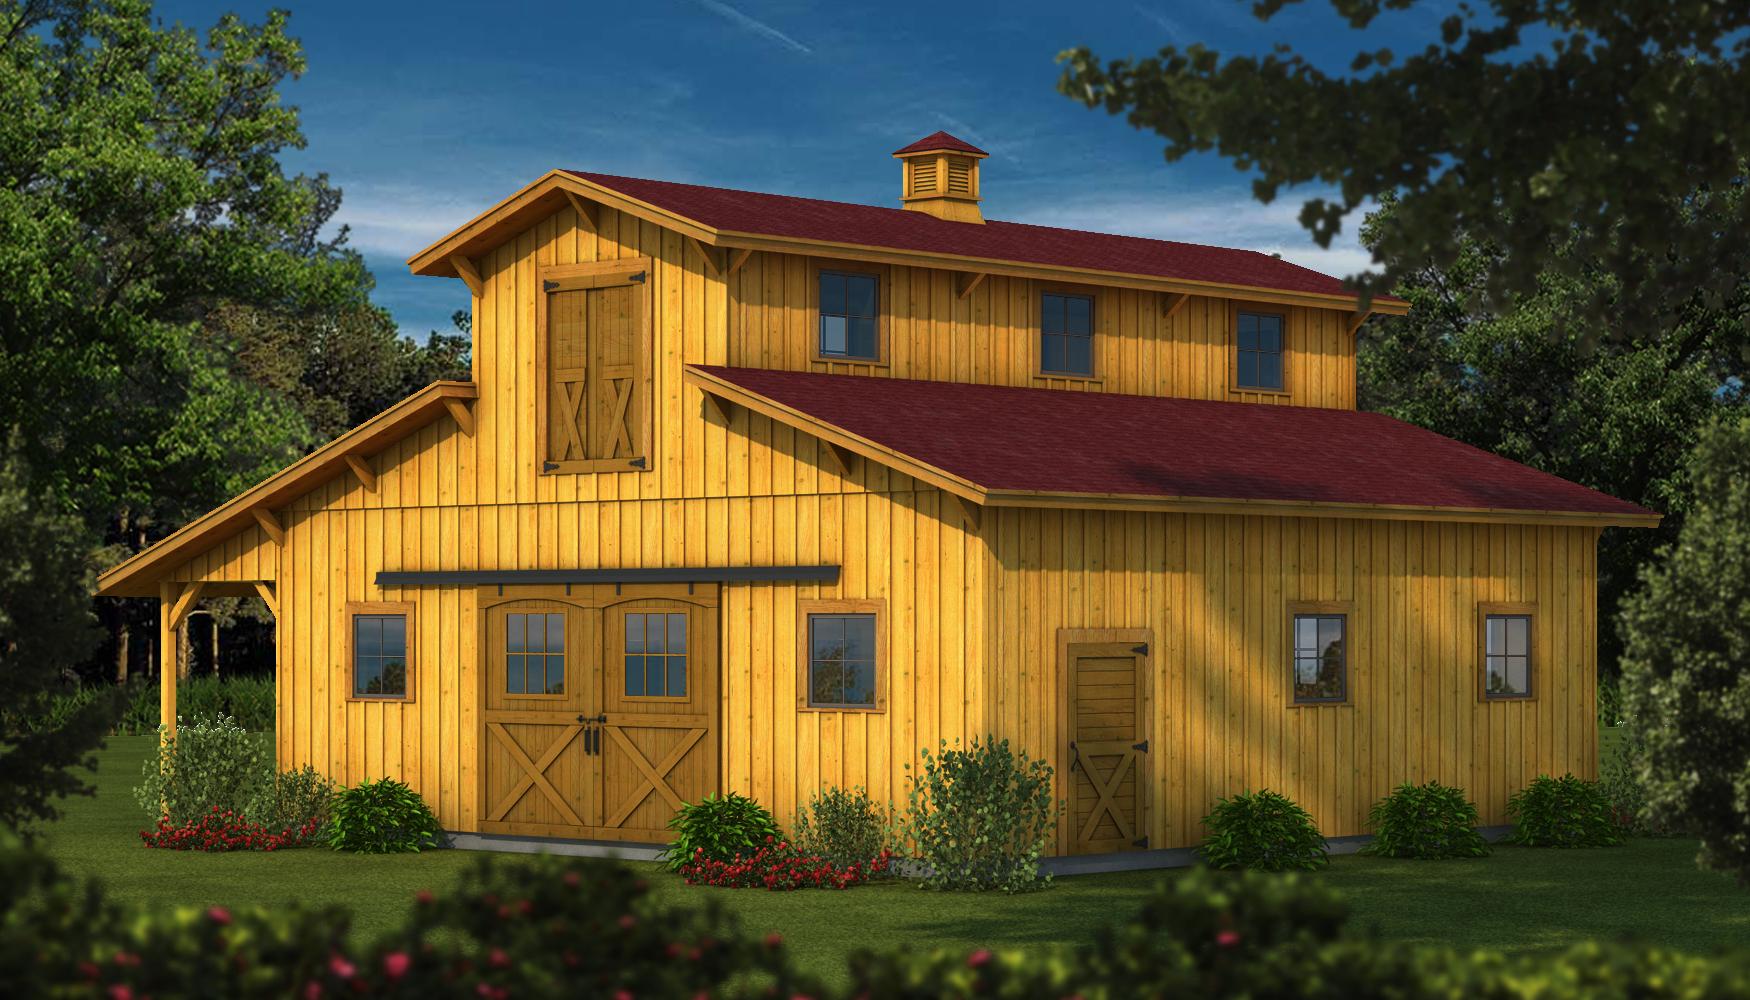 Dakota plans information southland log homes for Barn homes kits for sale